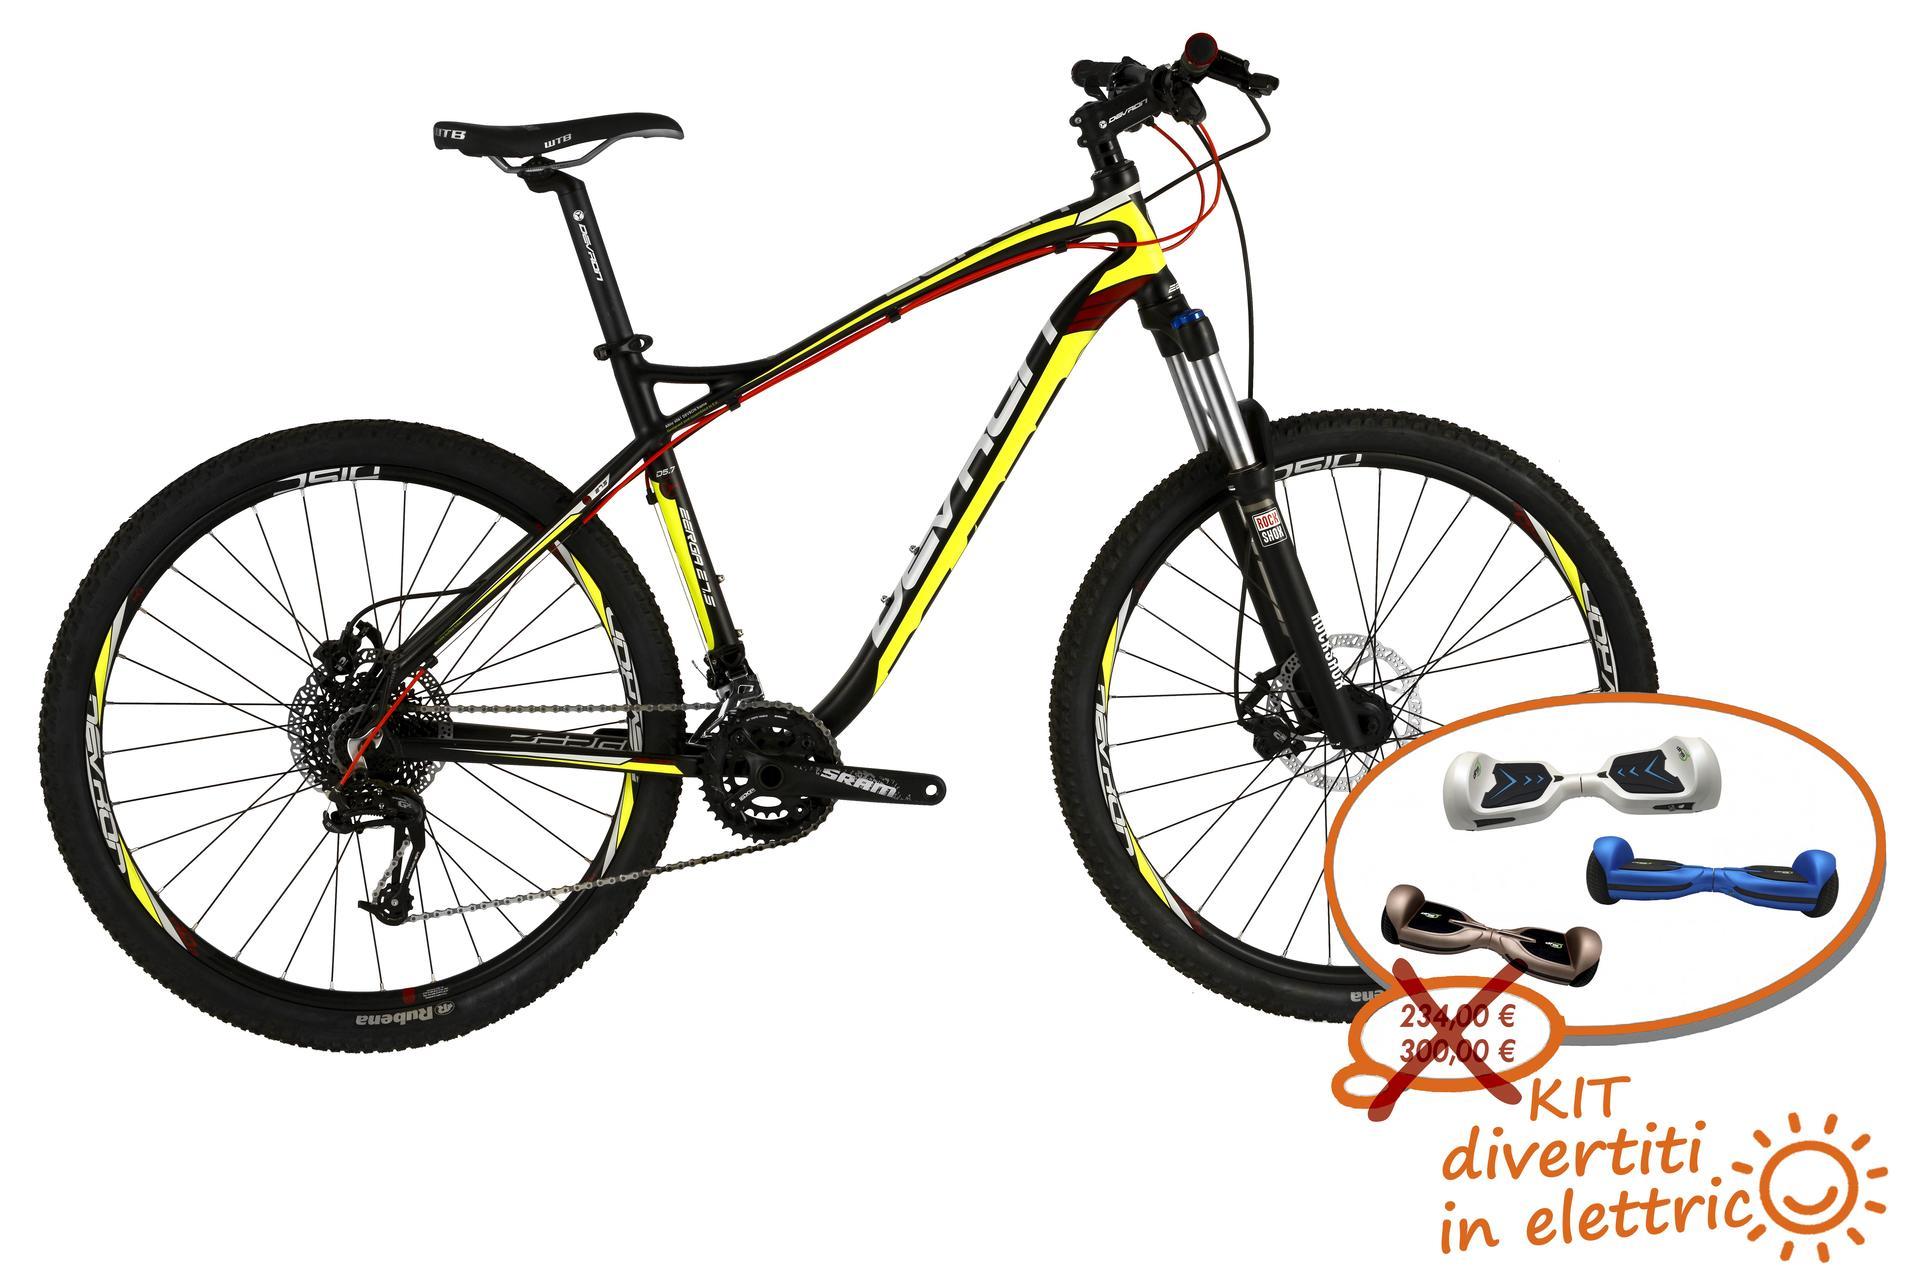 Mountain bike uomo Devron Zerga D5,7 Black Fury 495 mm